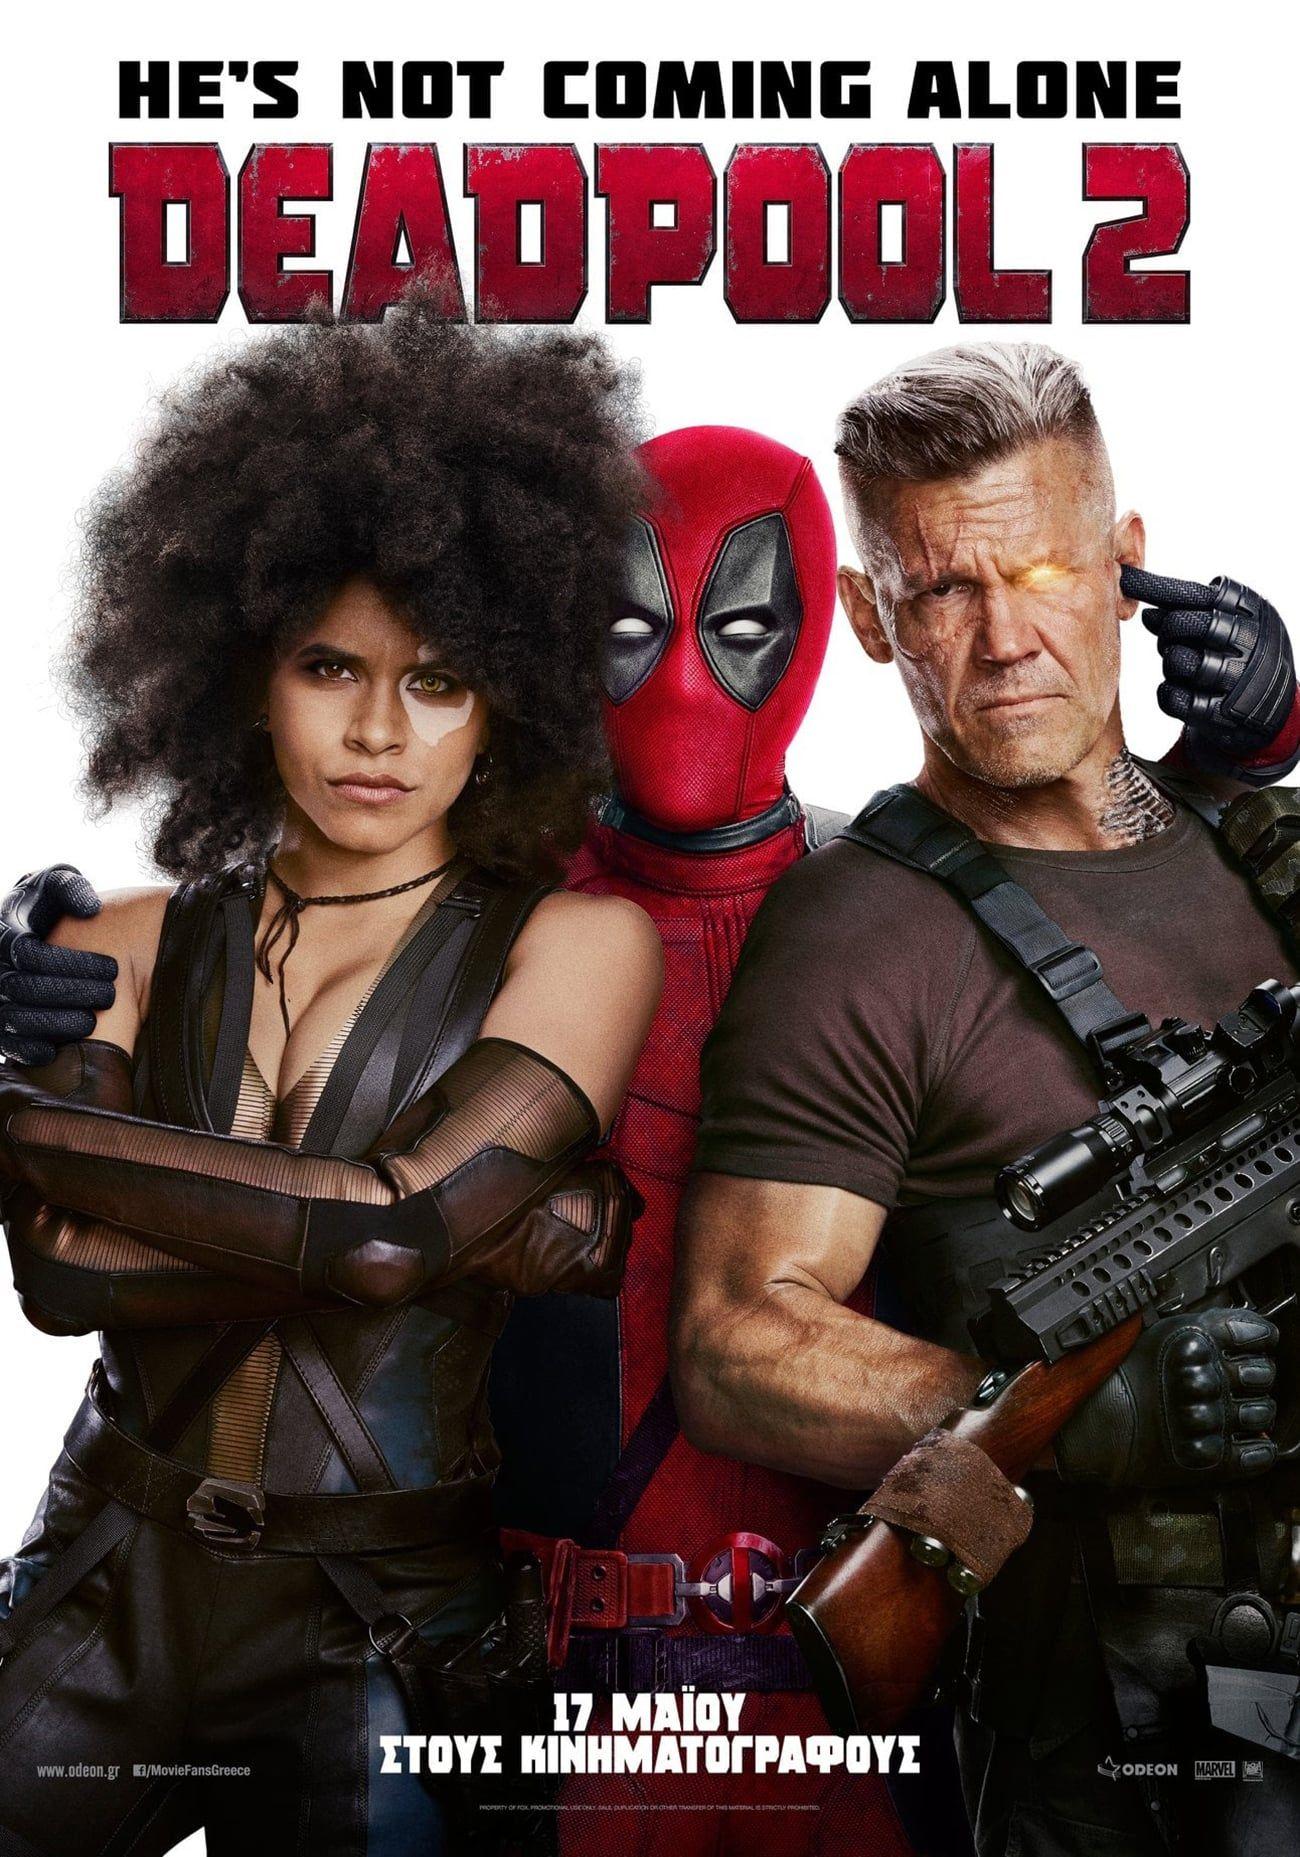 Ver Deadpool 2 Pelicula Completa Latino 2018 Gratis En Linea Cuevana9 Deadpool2 Movie Fullmovie St Deadpool Movie Deadpool 2 Movie Free Movies Online